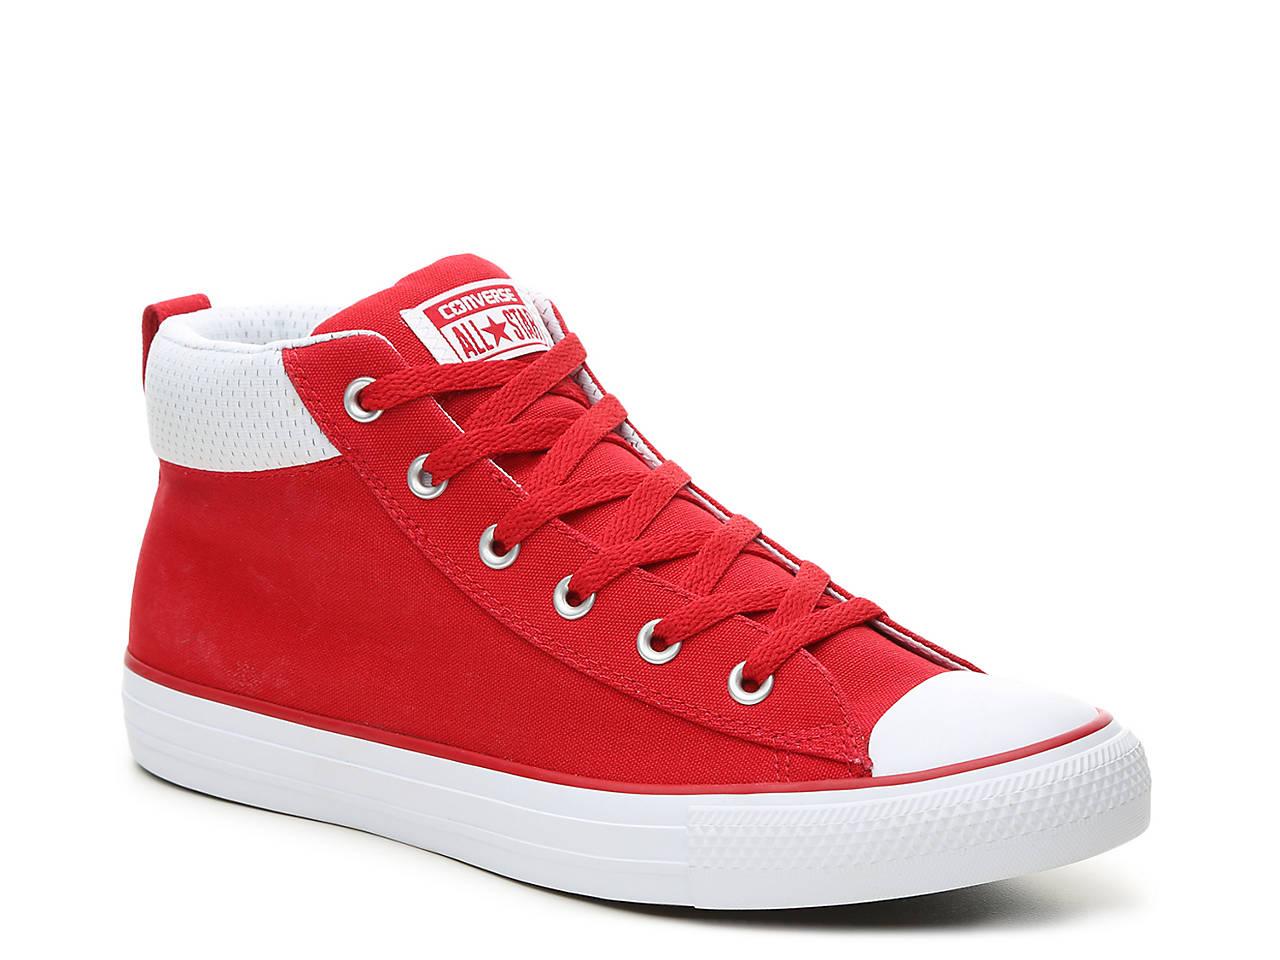 7973056cb389 Converse Chuck Taylor All Star Street Mid-Top Sneaker - Women s ...